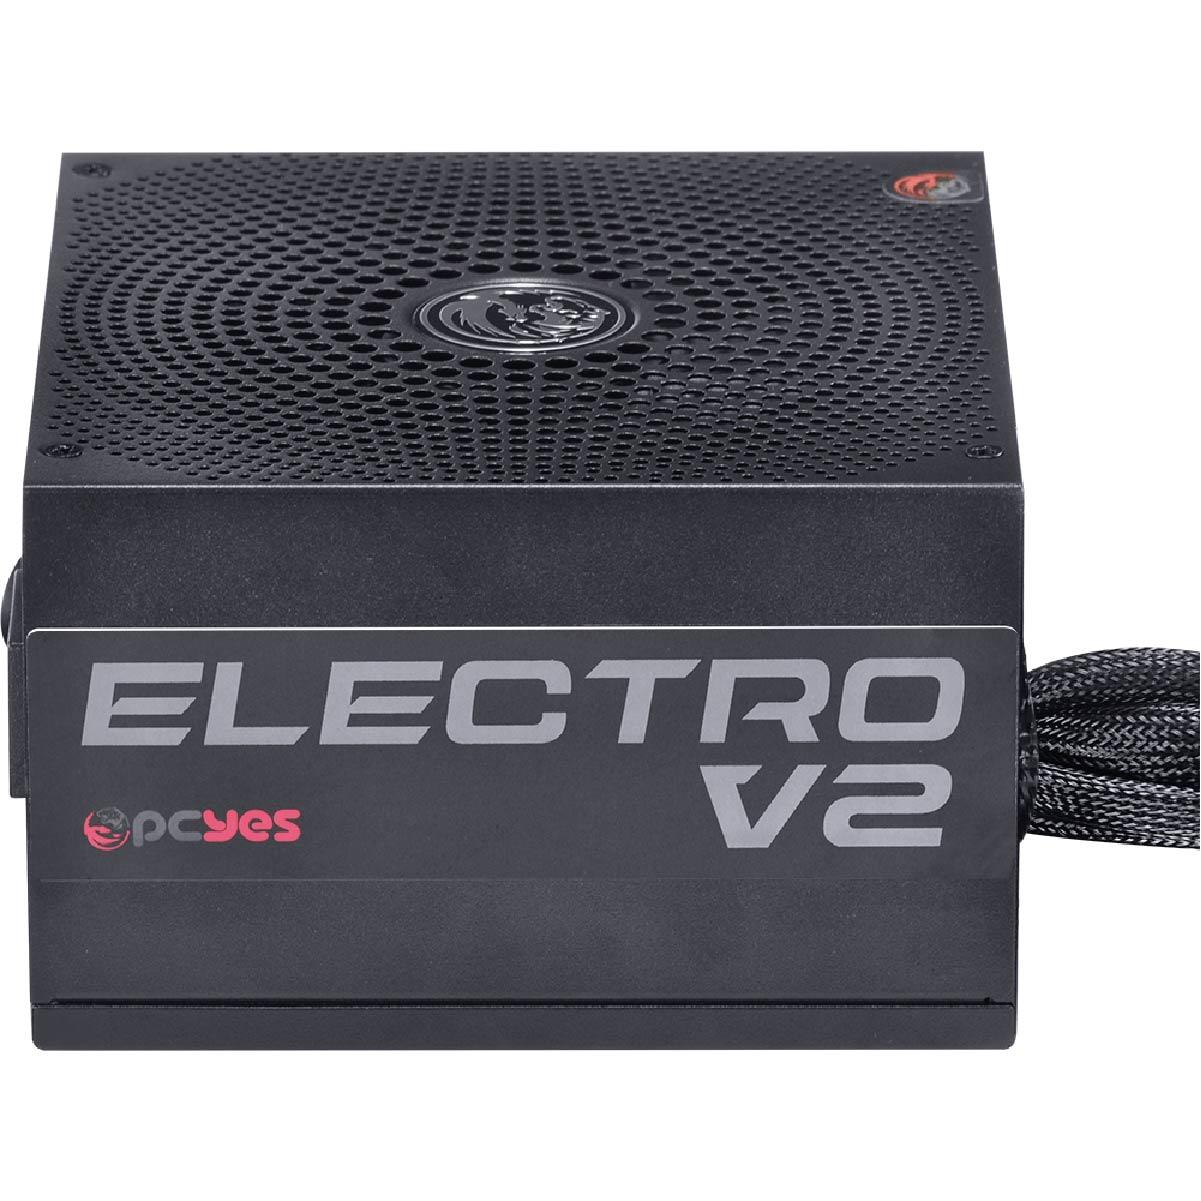 Fonte ATX 550W Pcyes Electro V2 80 Plus Bronze PFC Ativo